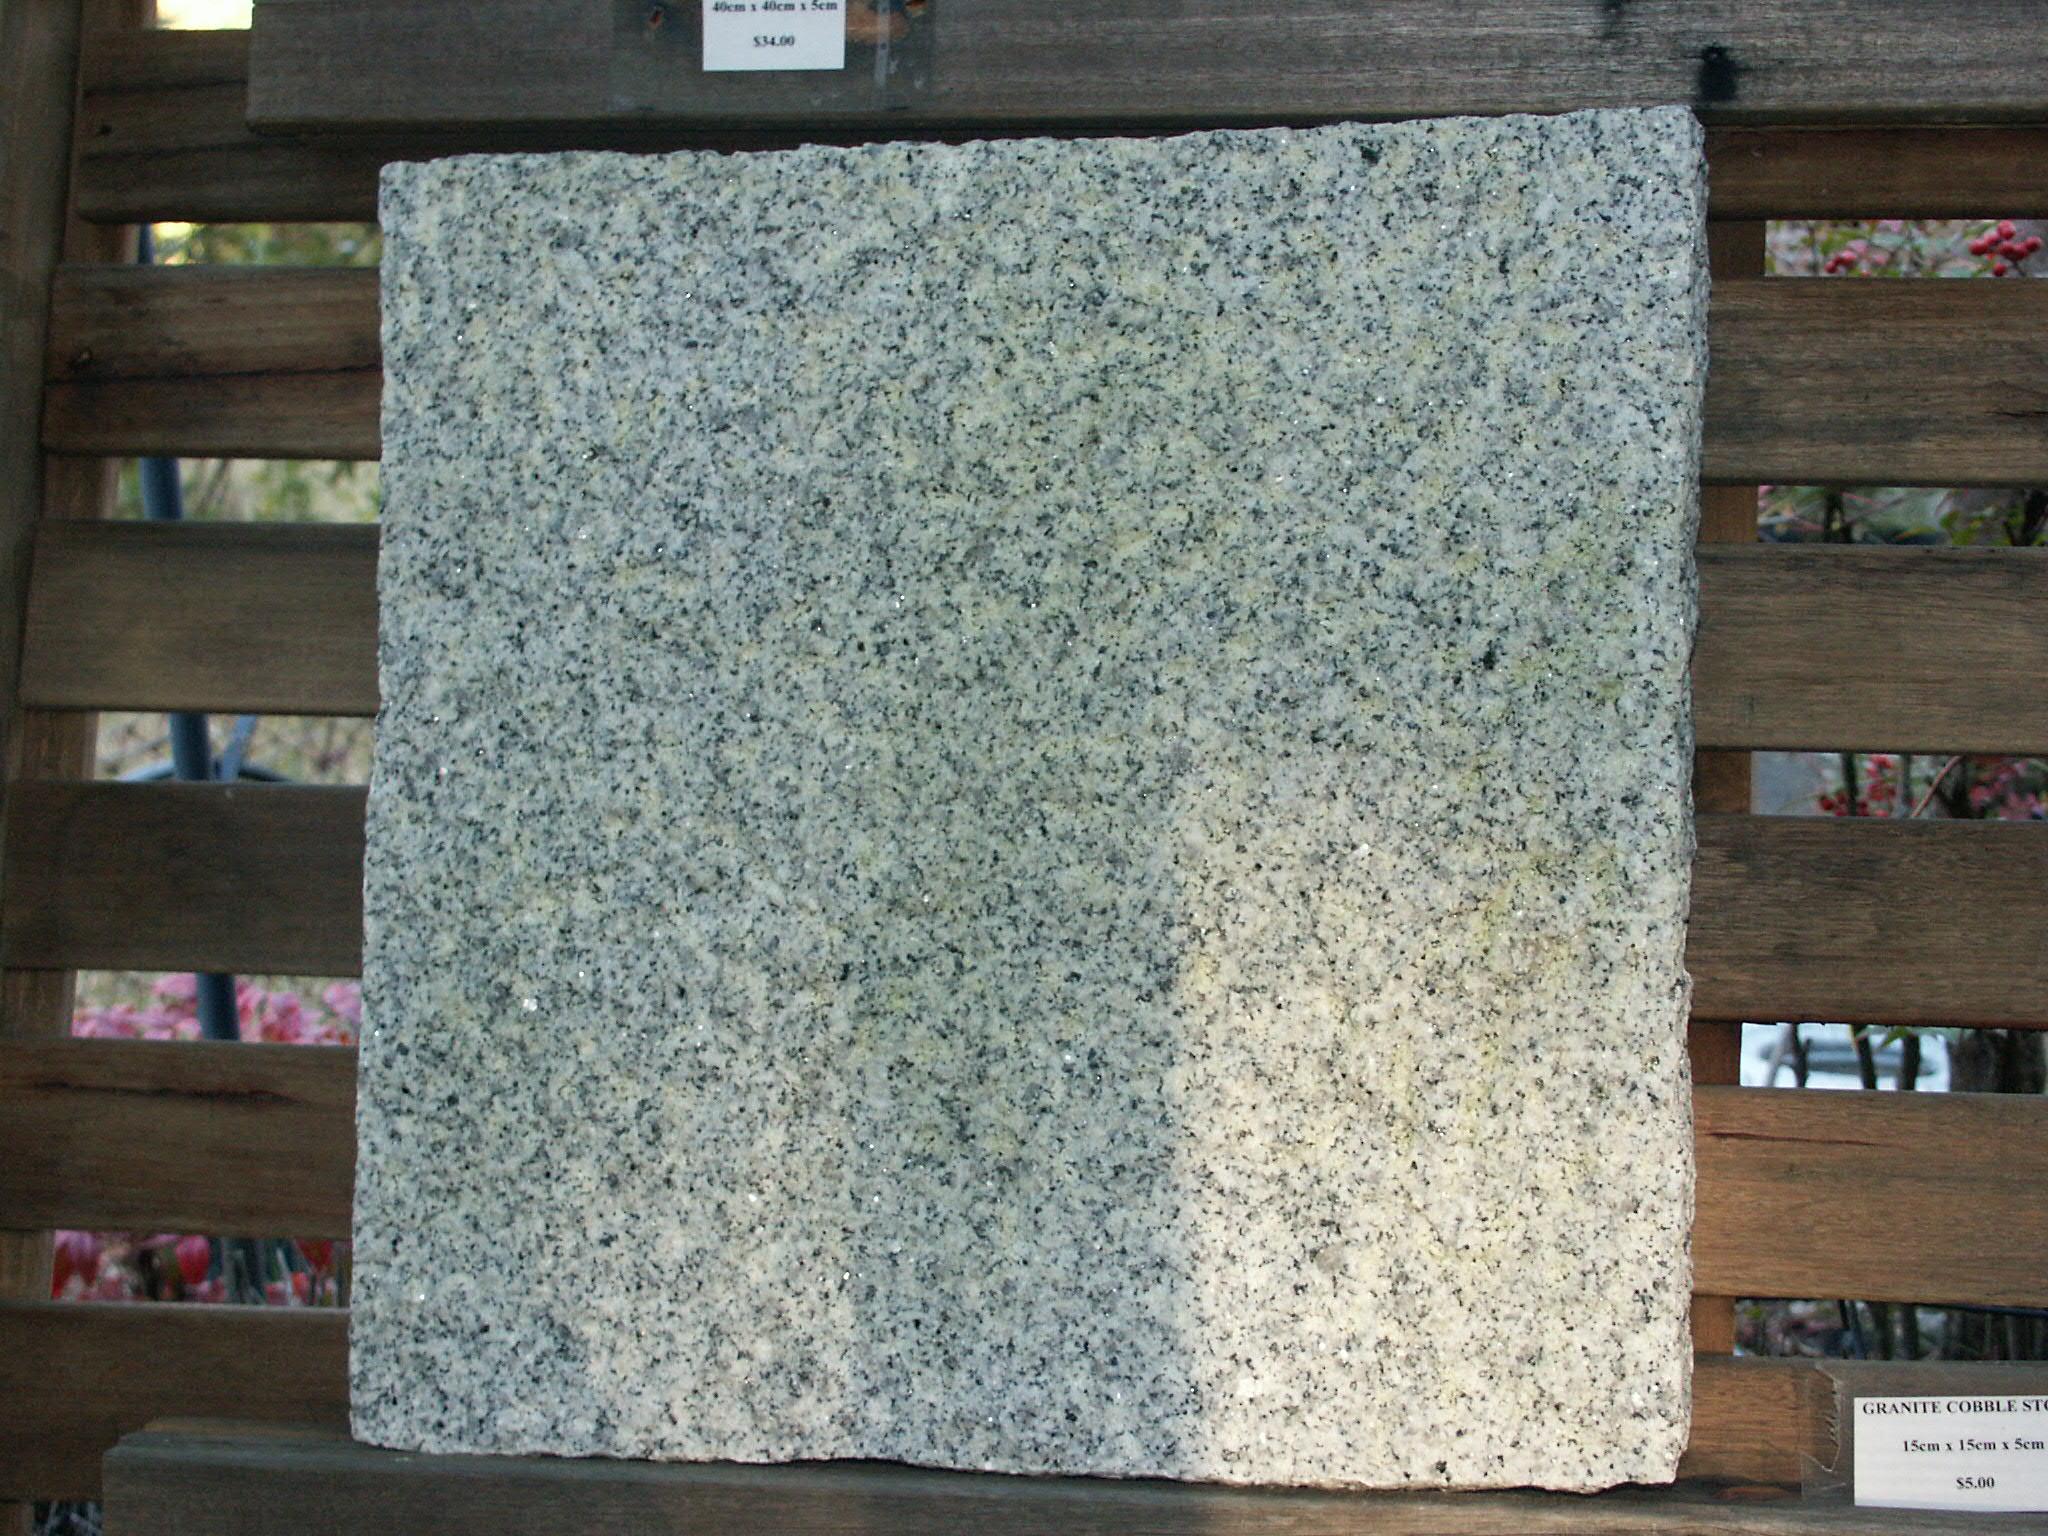 Paver Granite  S - M<br> 30x30x6 $30 <br>45x45x6 $45 <br>60x60x6 $65 <br>30x60x6 $45 <br>45x90x6 $90